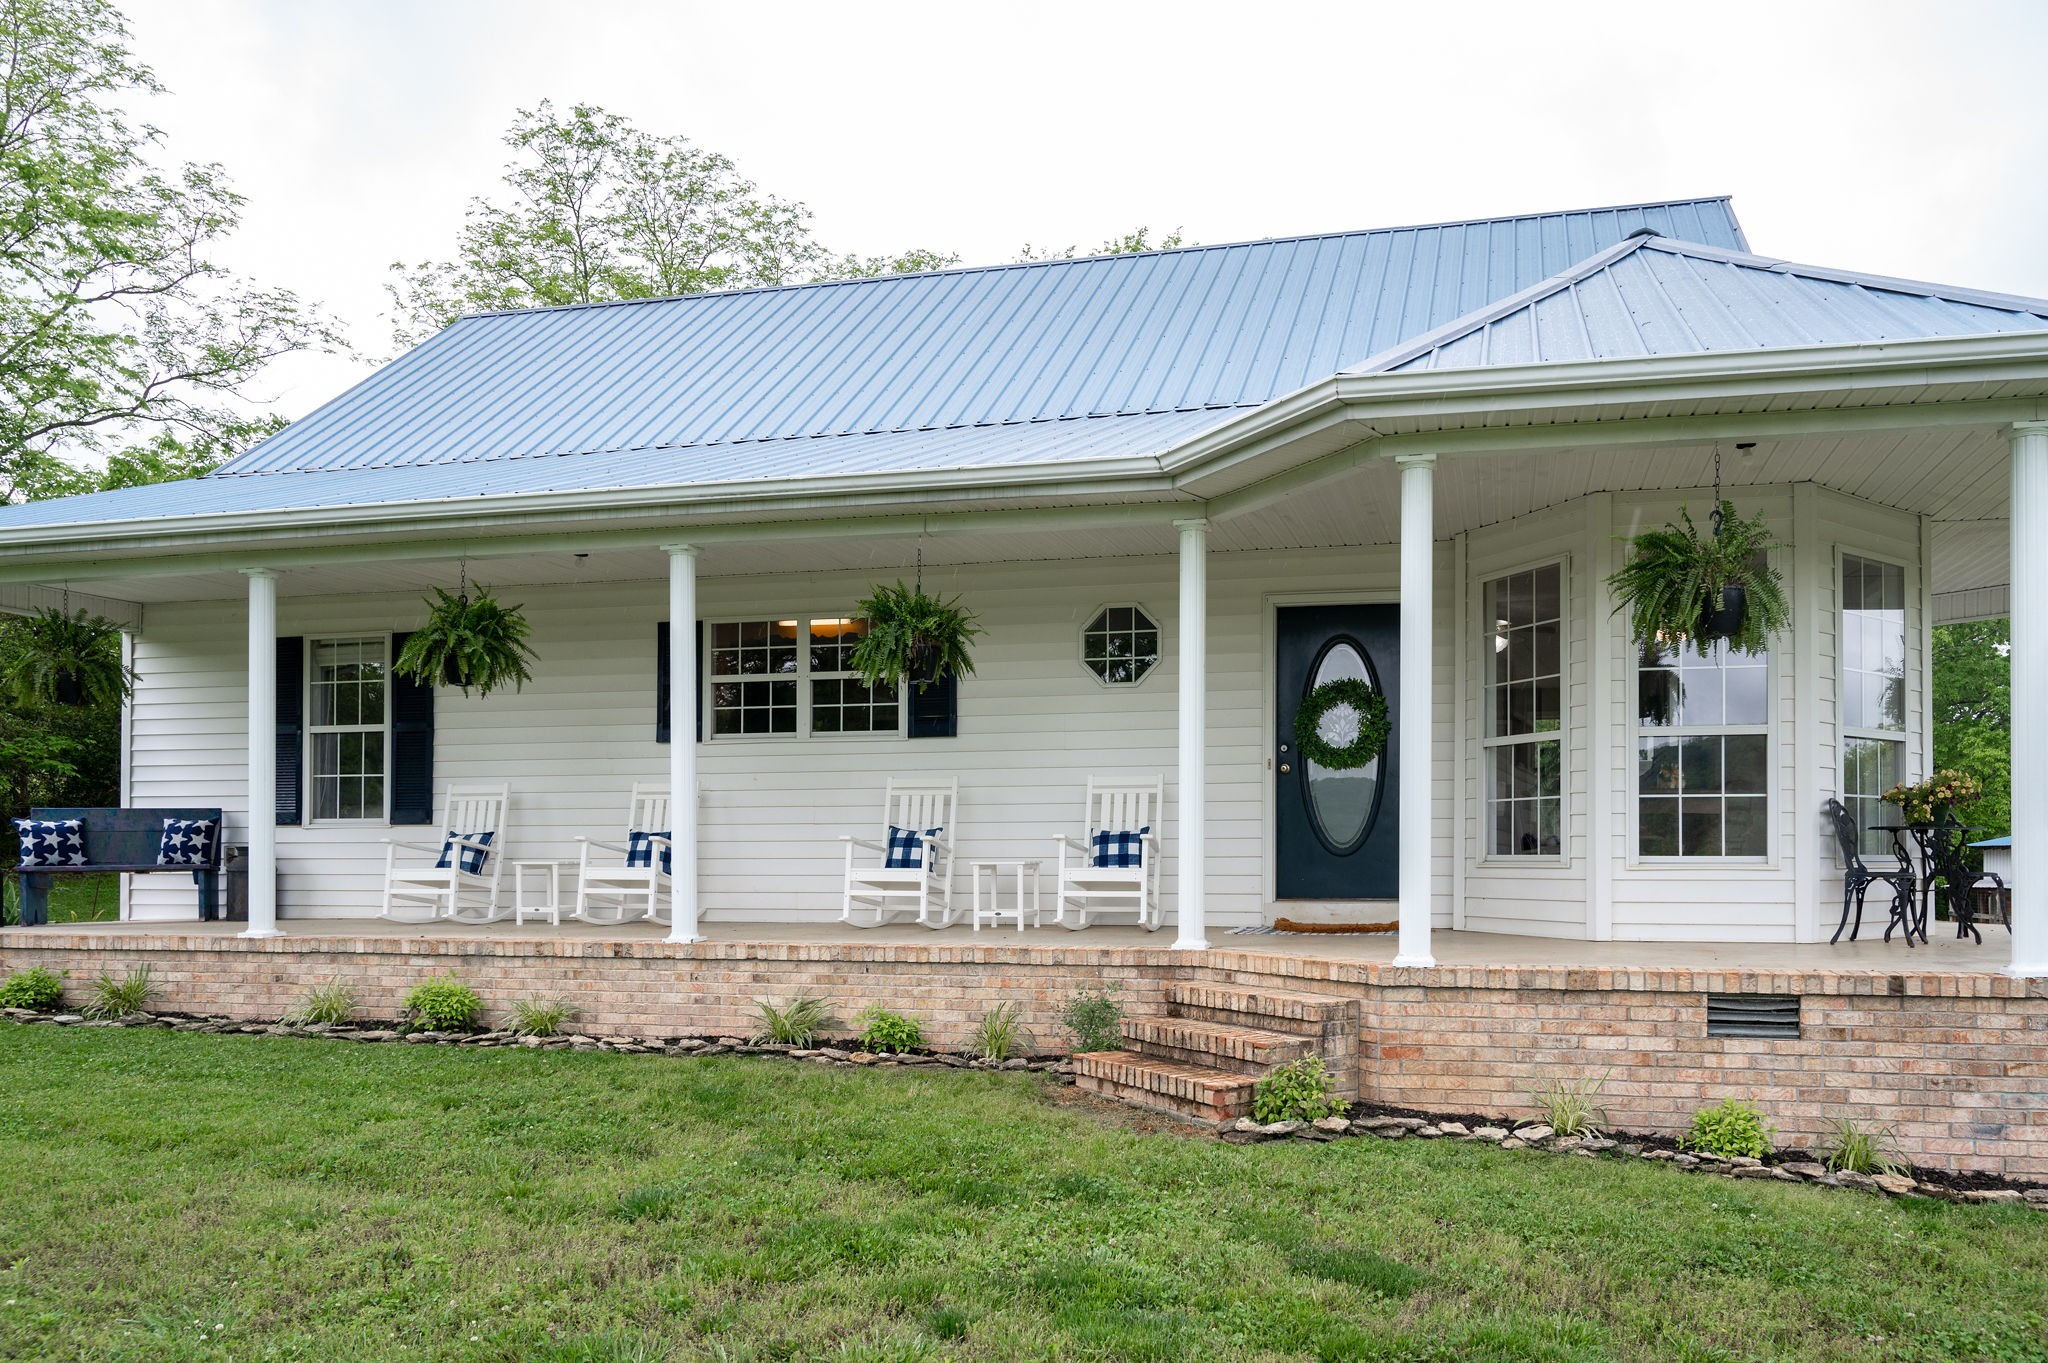 205 Haley Ln, Woodbury, TN 37190 - Woodbury, TN real estate listing